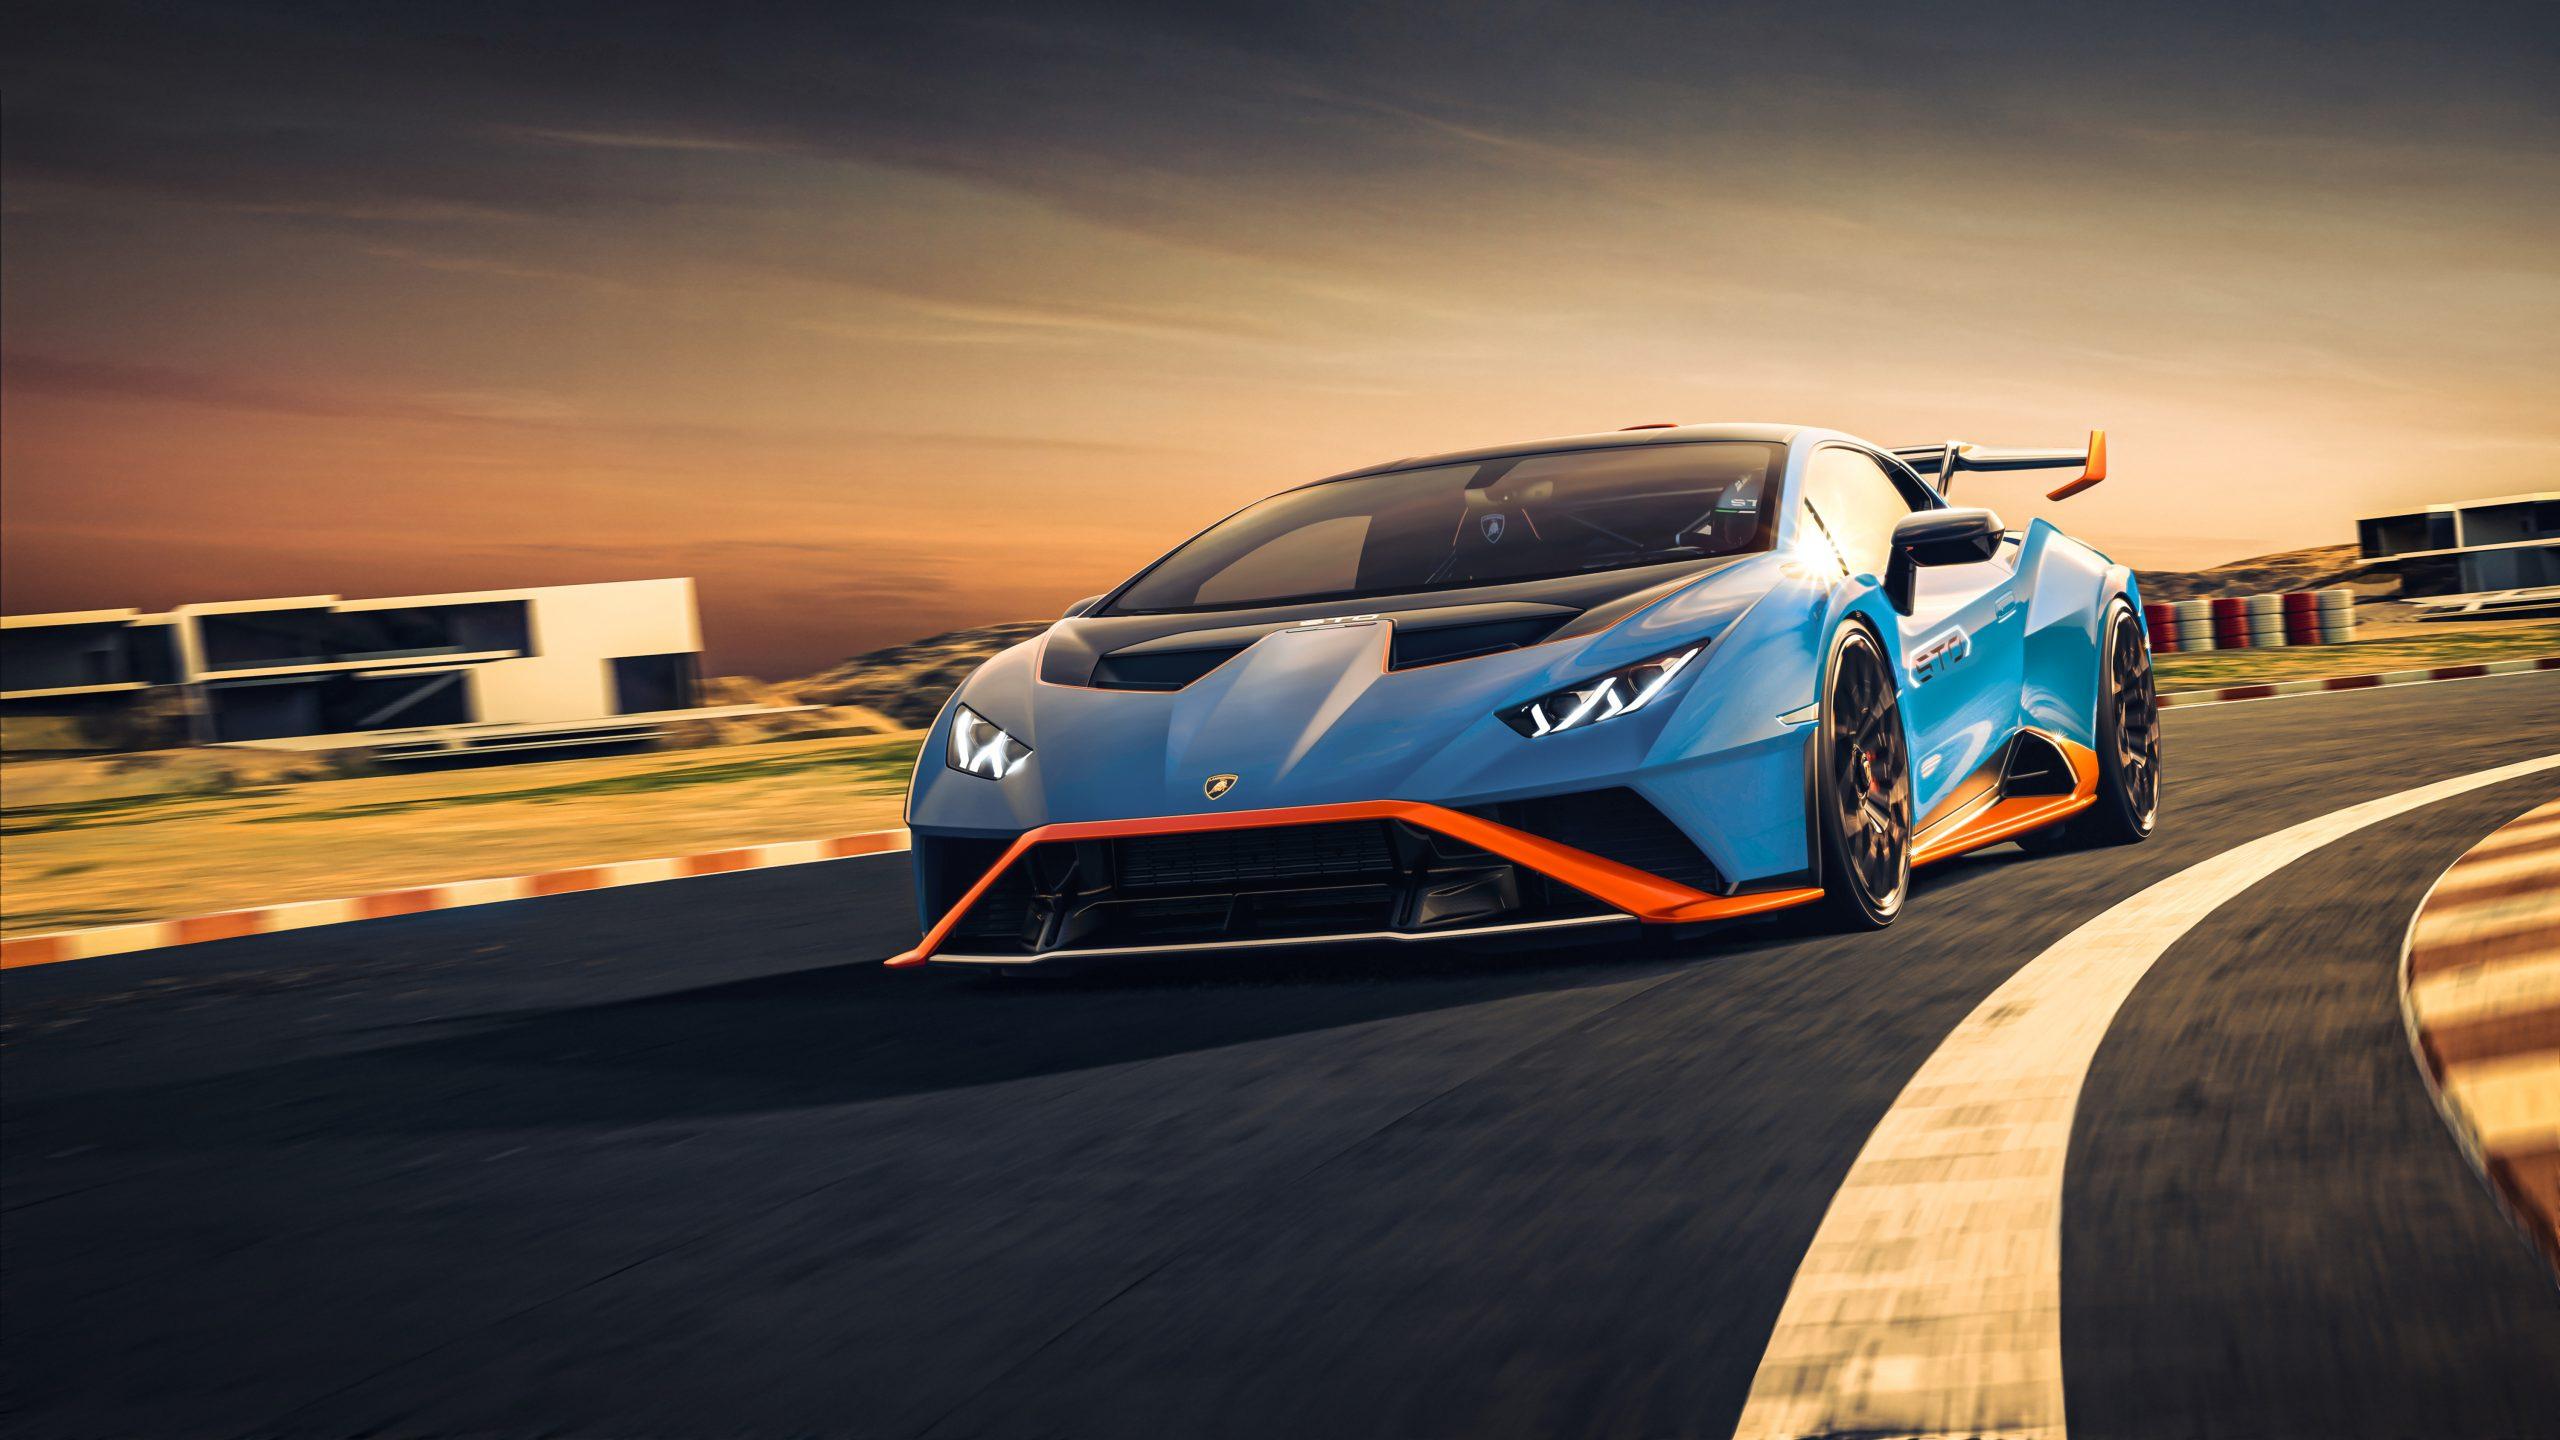 Lamborghini Huracan STO track 2